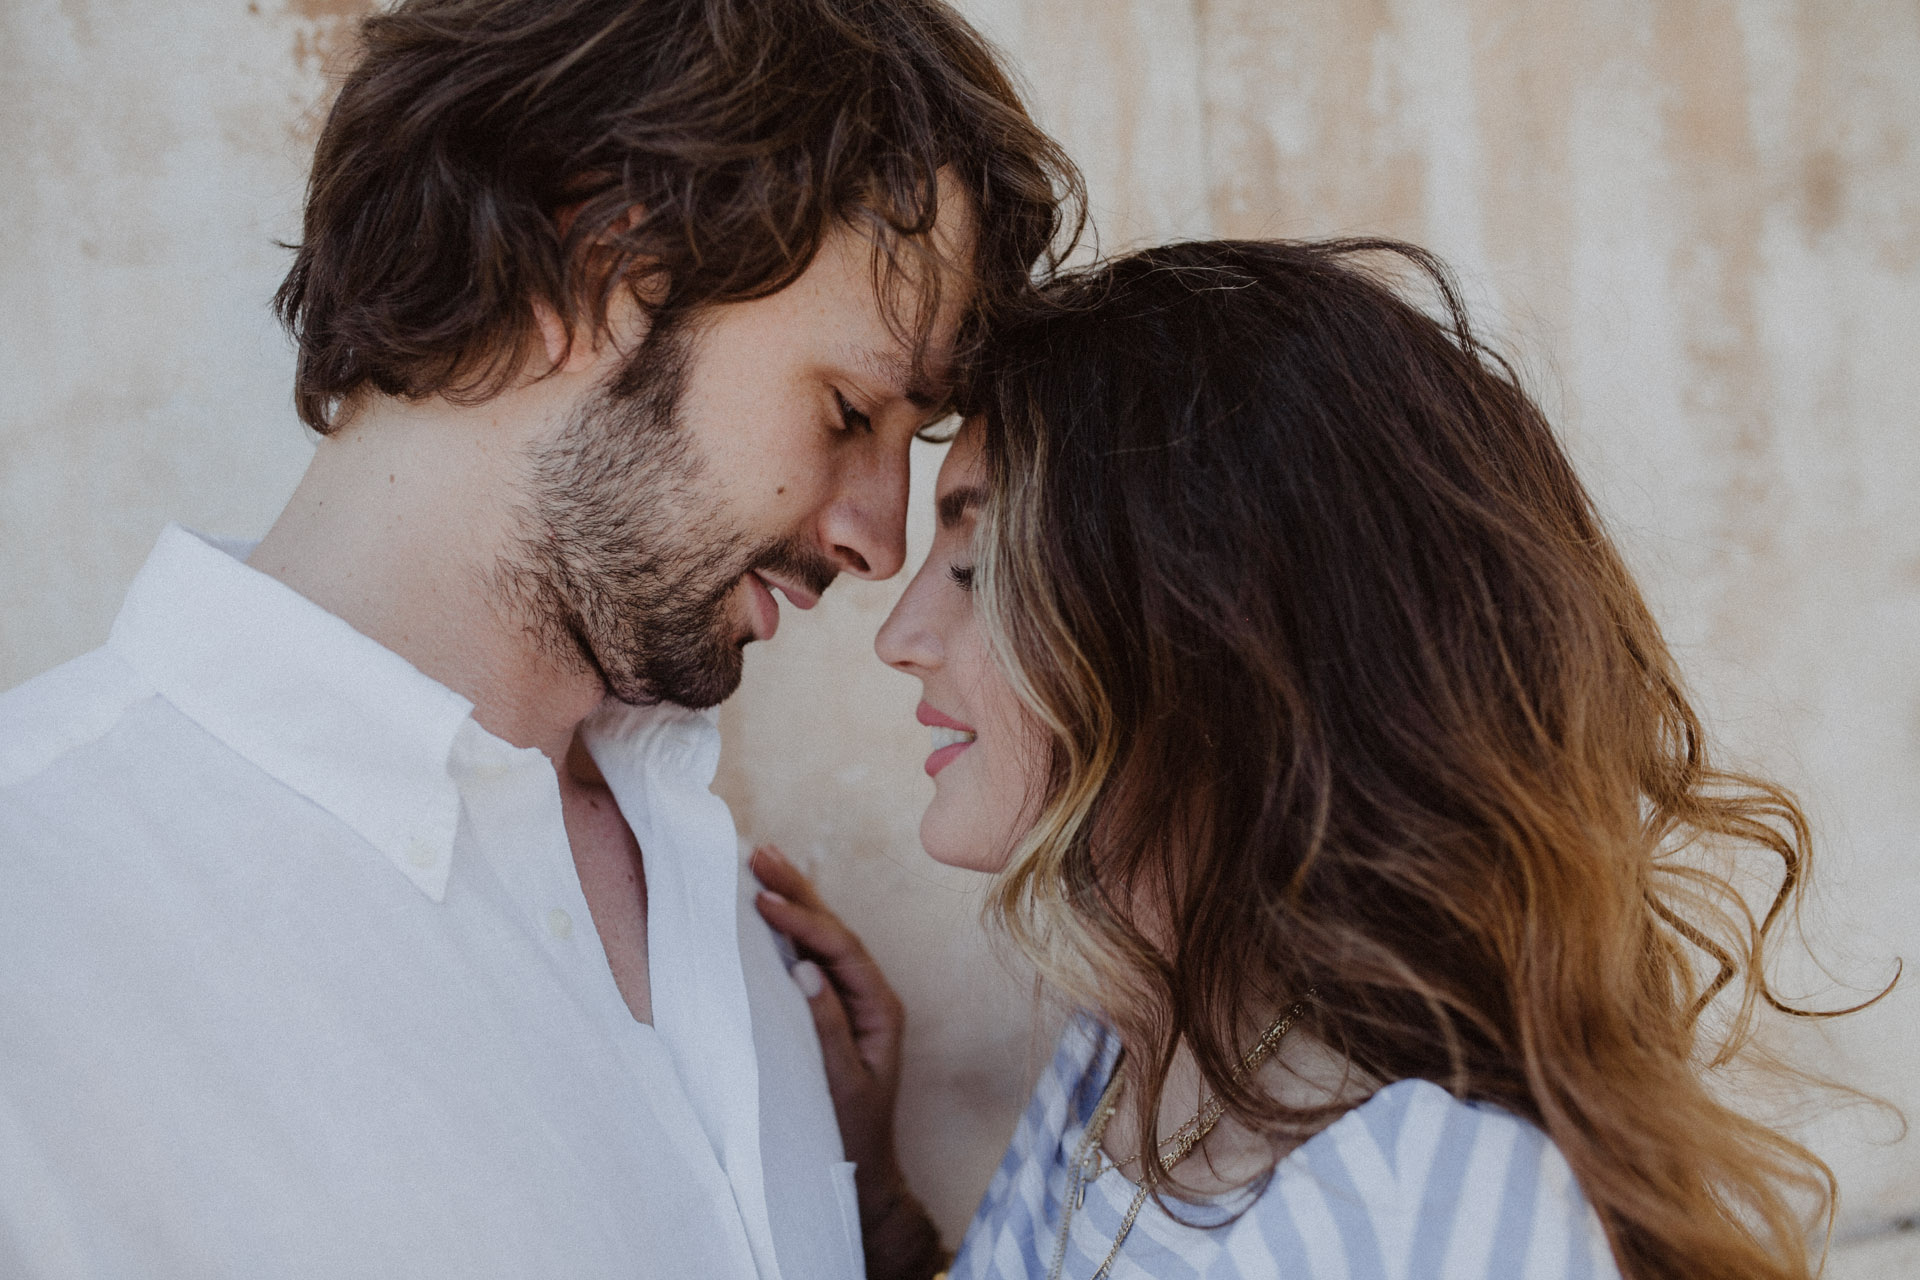 coupleshooting-roma-hochzeitsfotografen-wien-agnesundandi-10